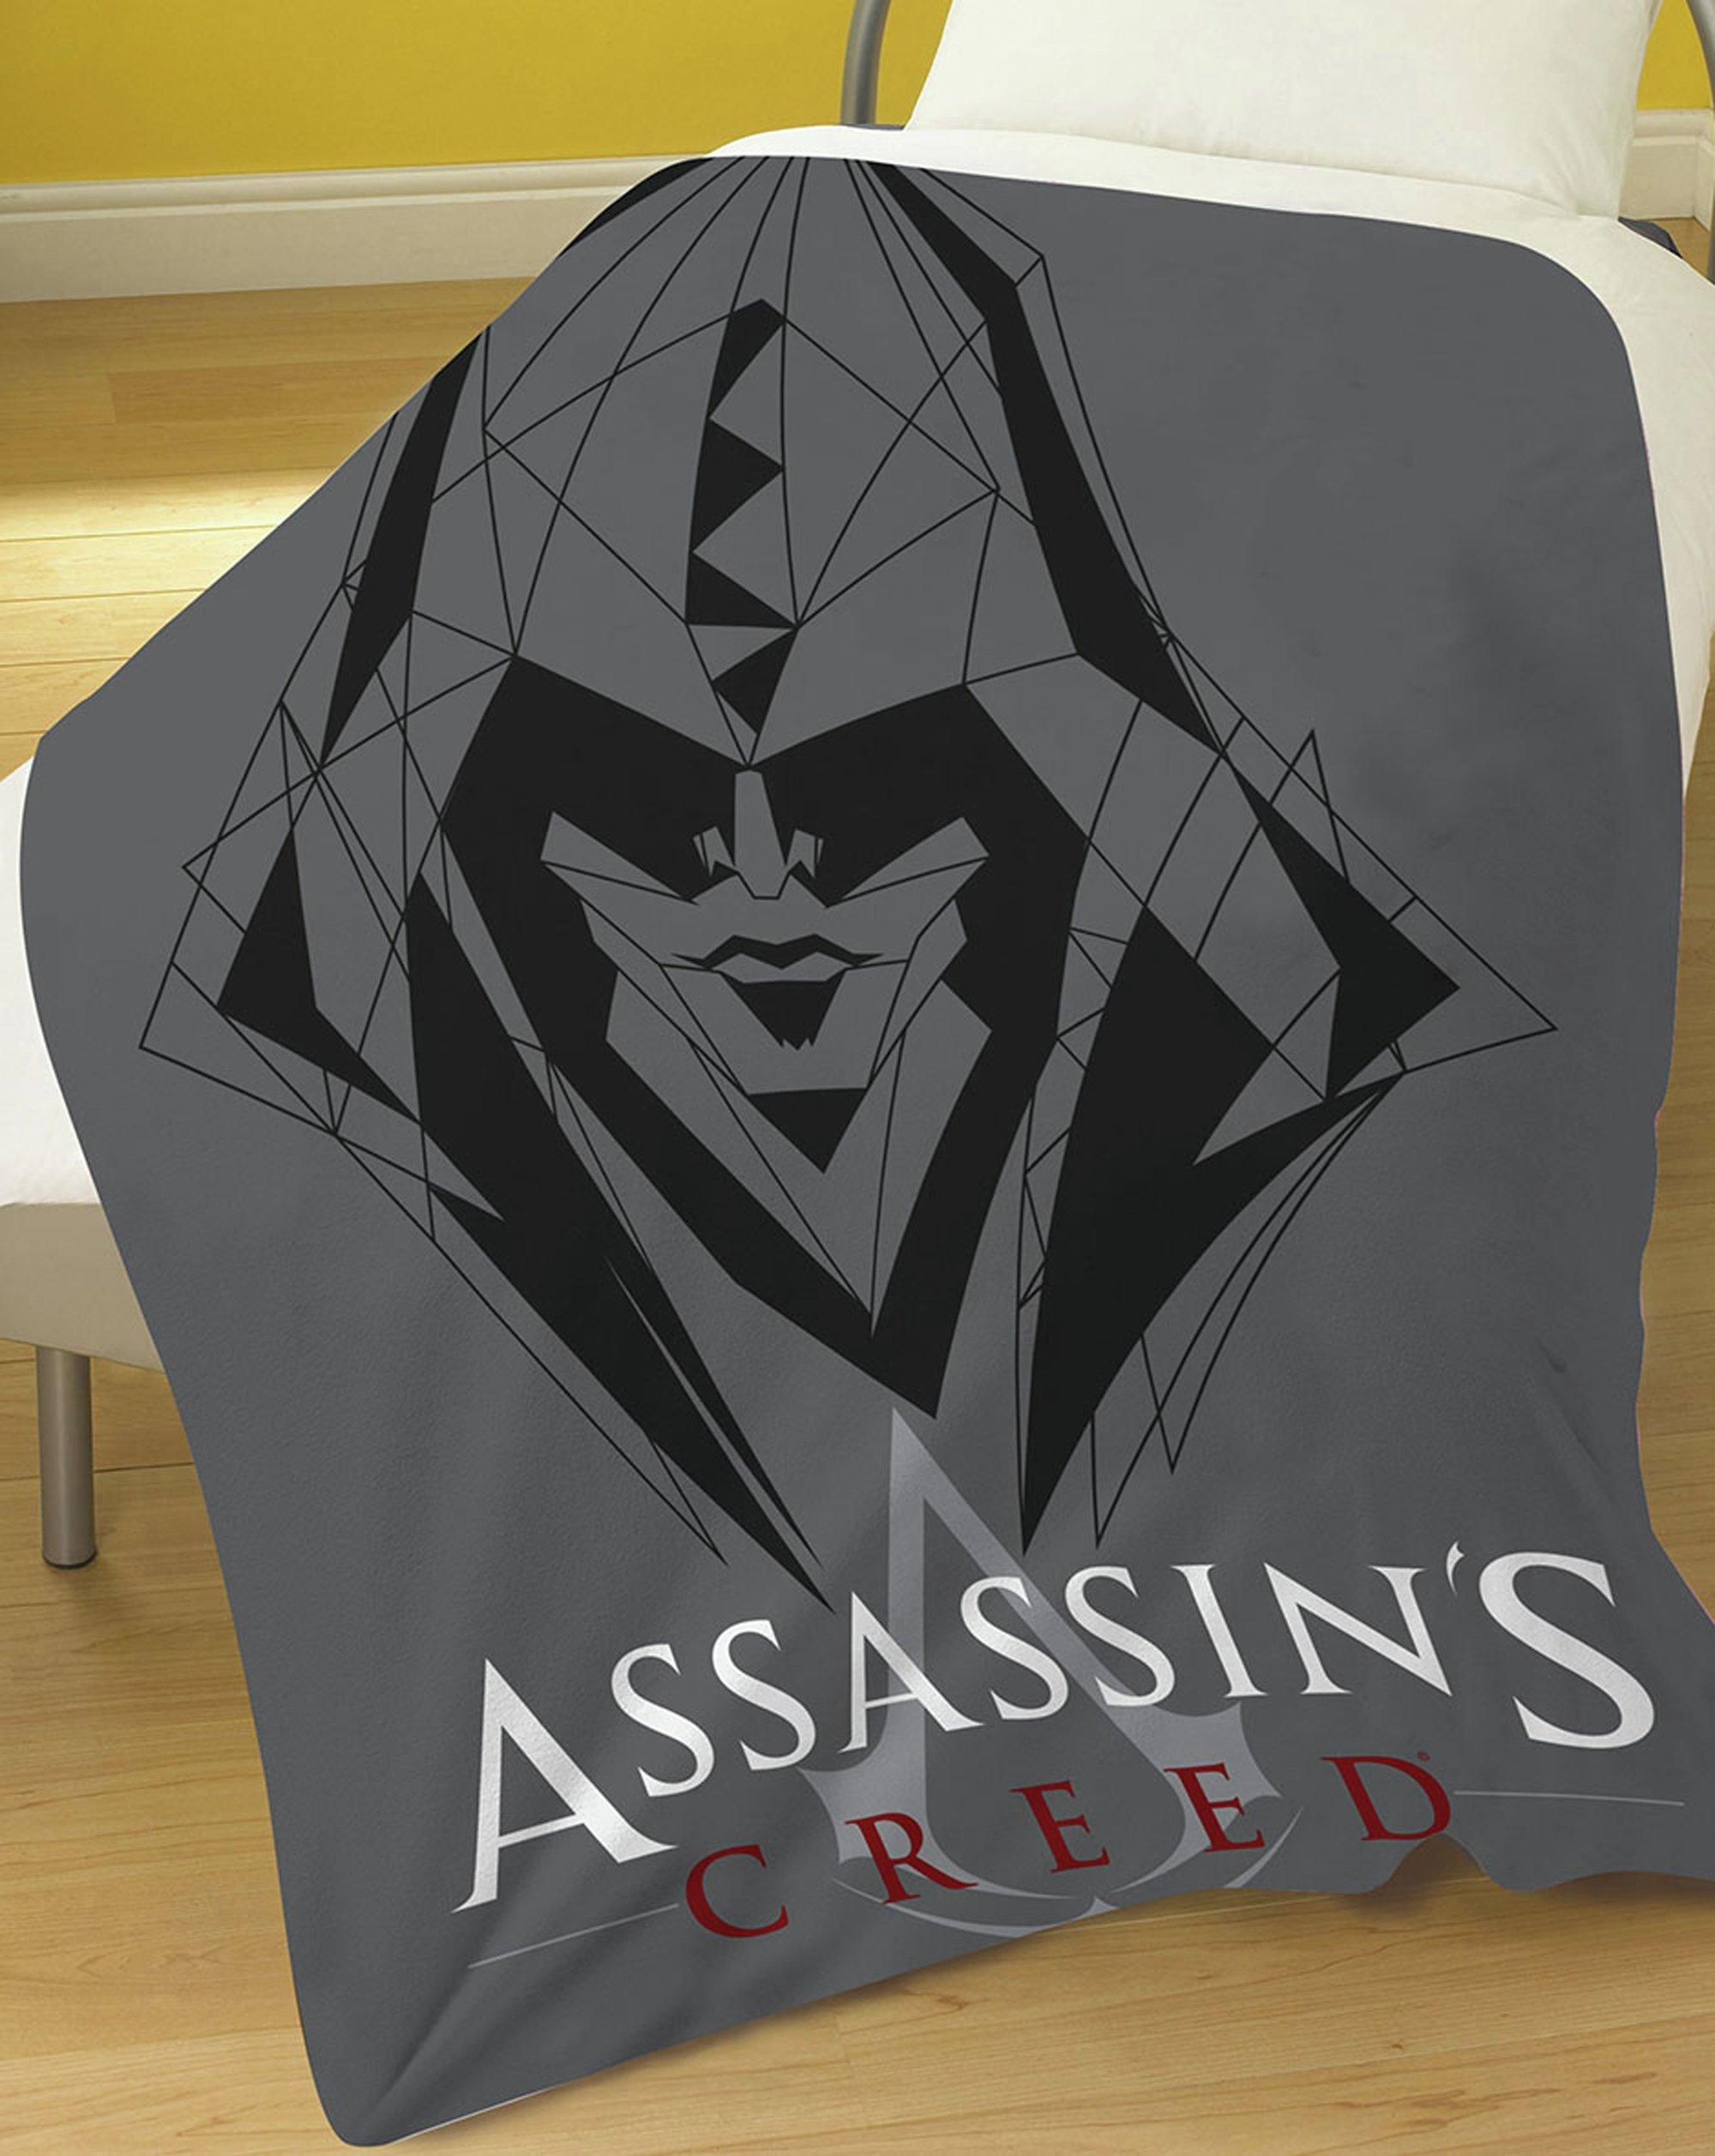 Image of Assassin's Creed Fleece Blanket.